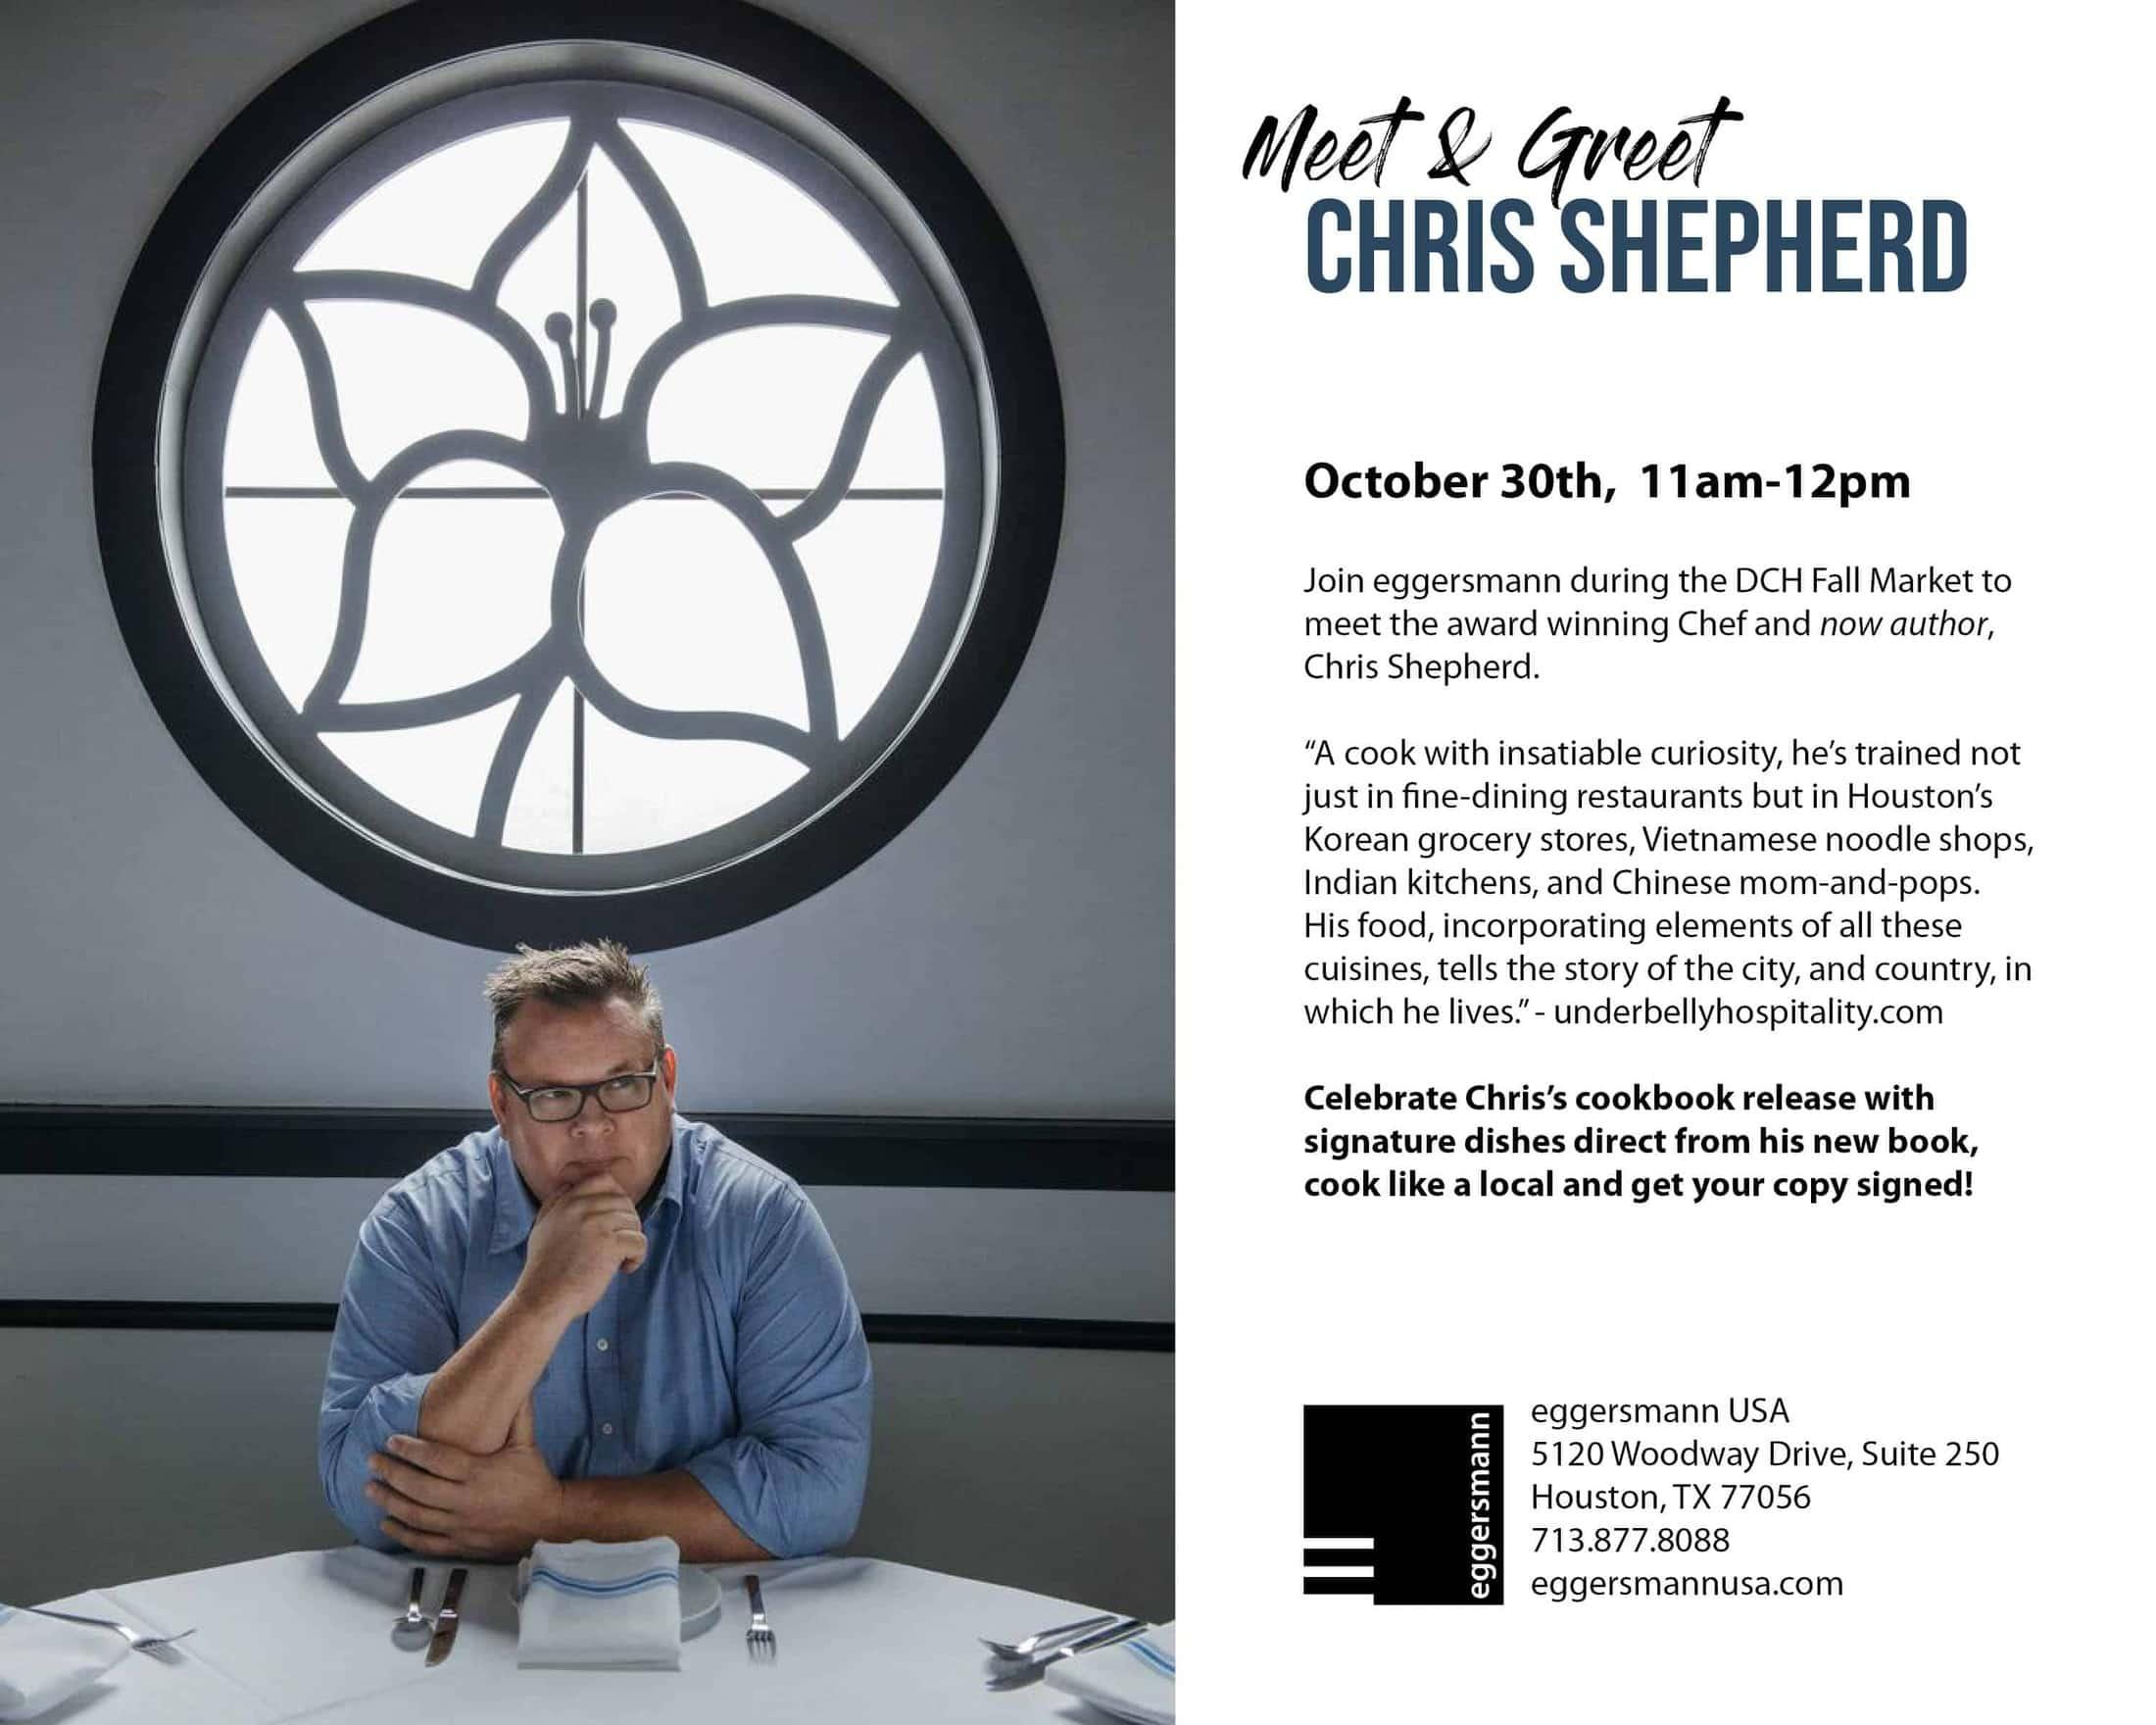 Meet and Greet Chris Shepherd